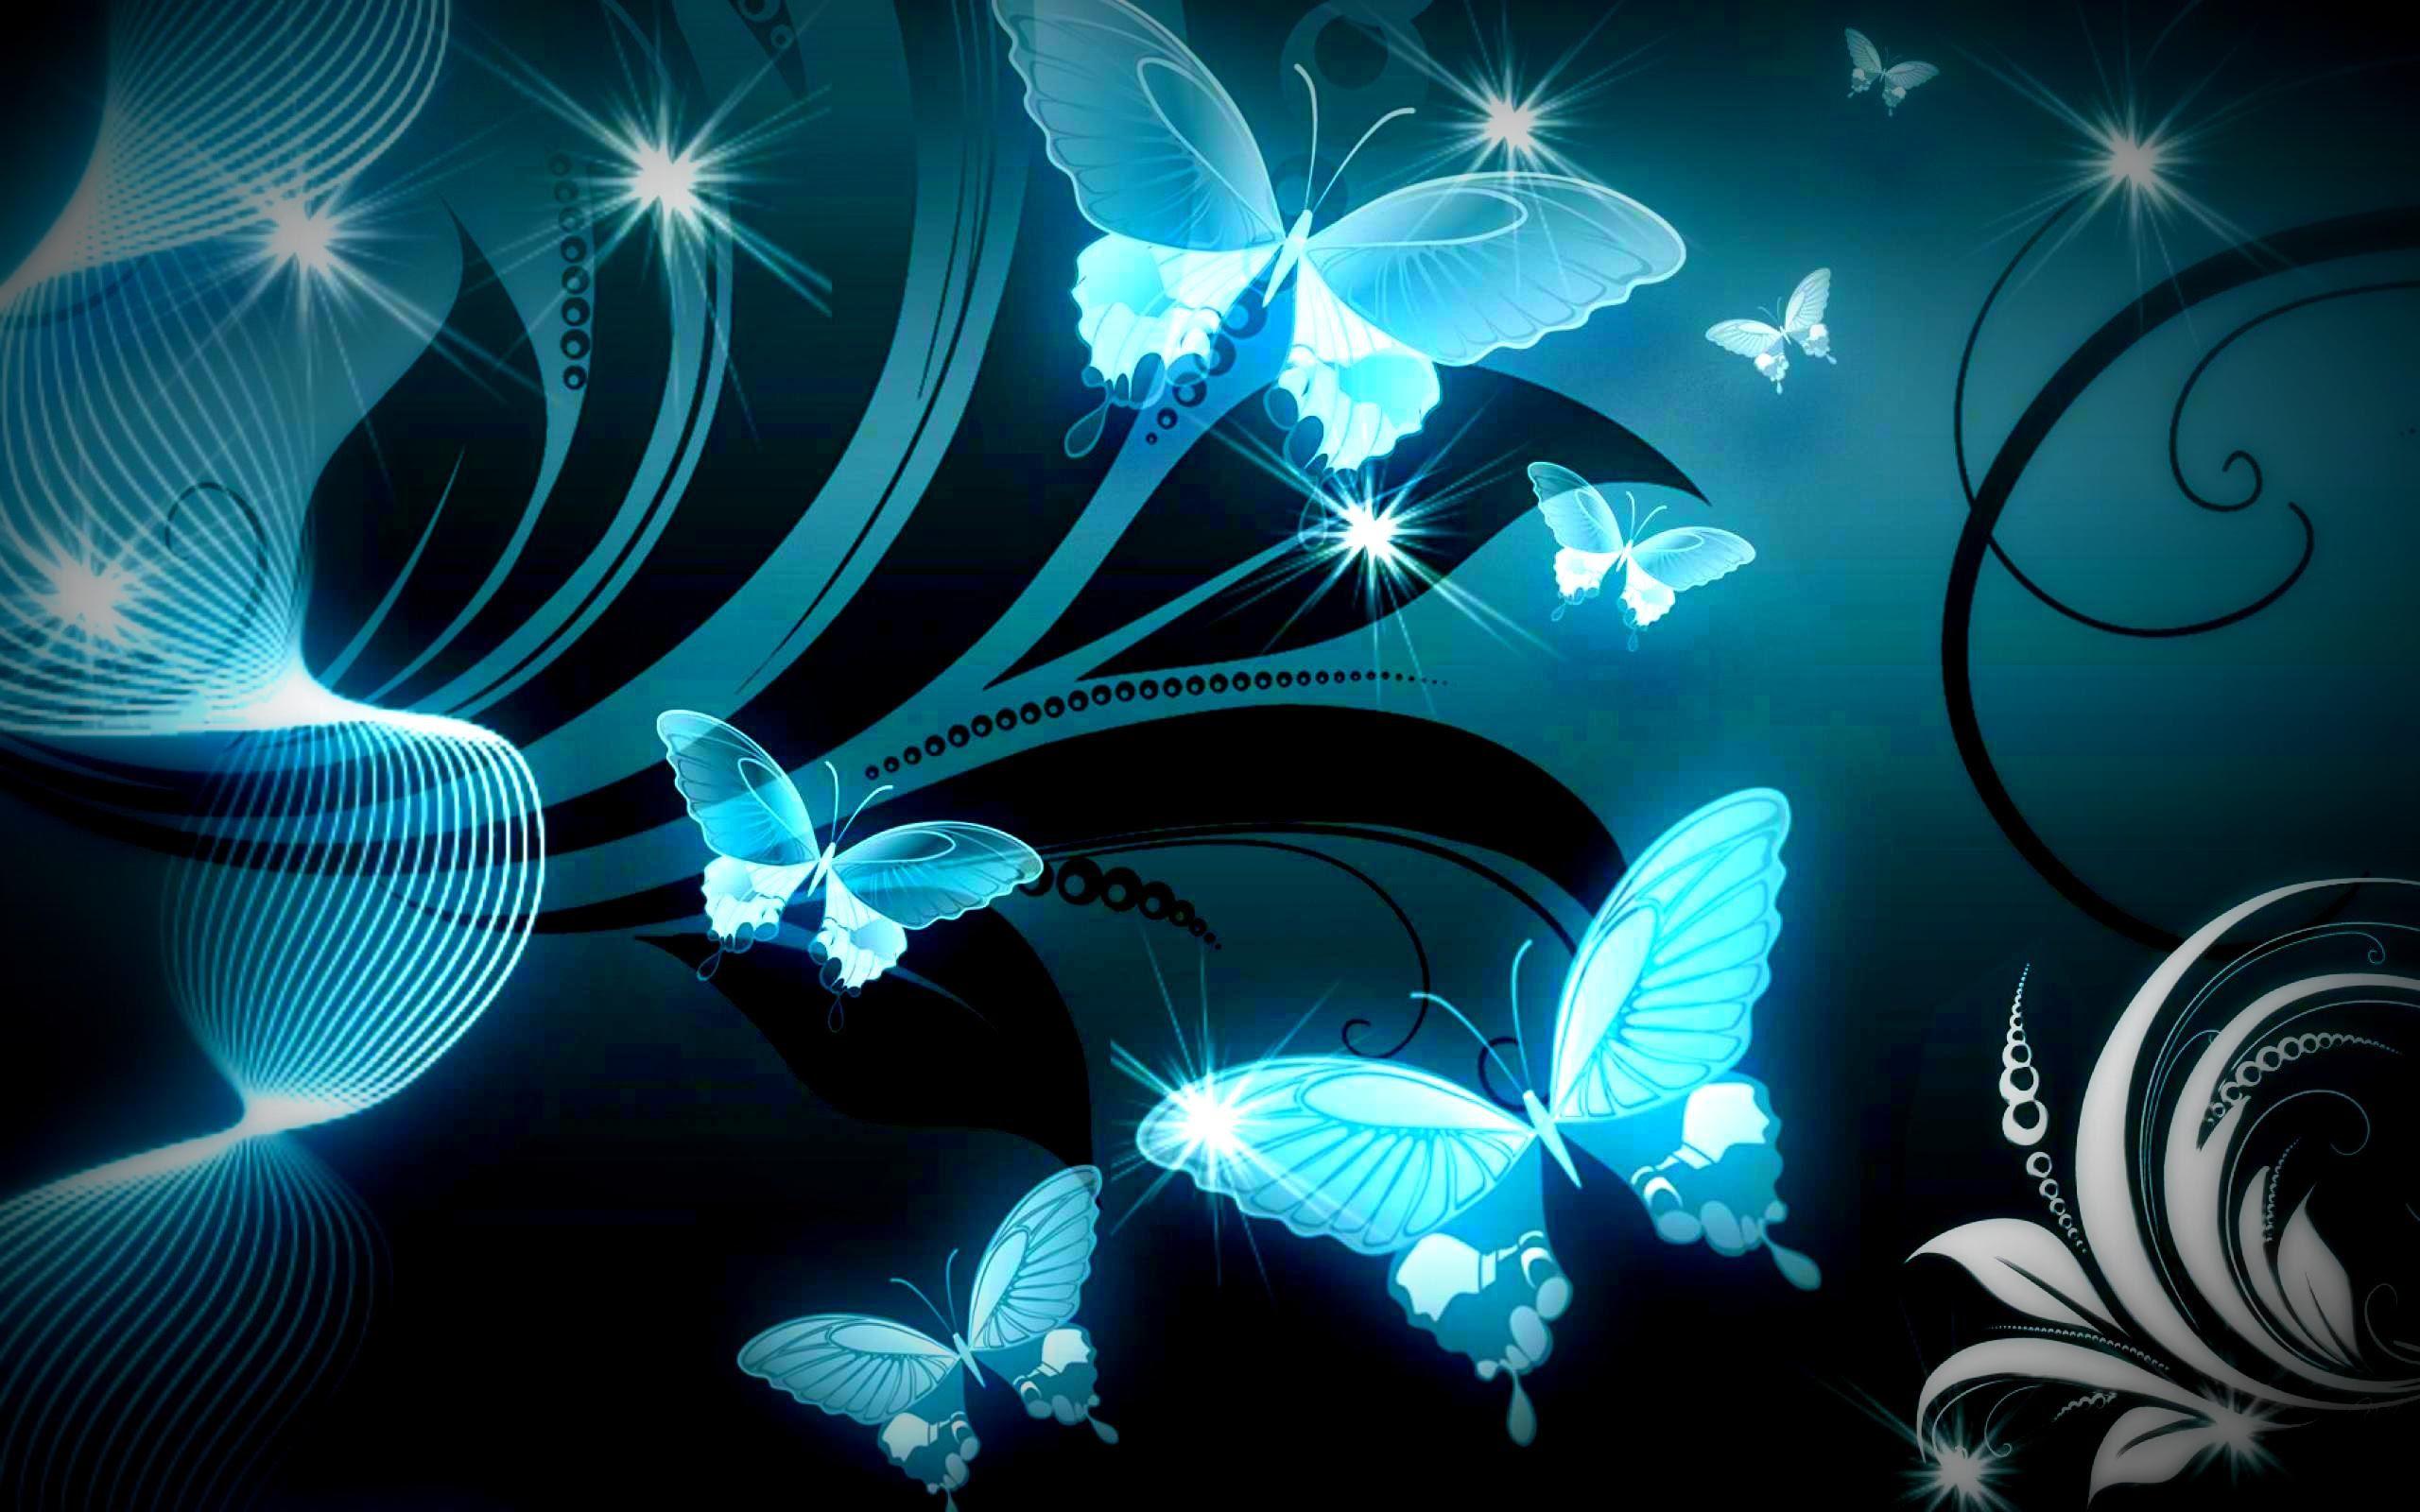 Butterfly Desktop Wallpaper (62+ images)